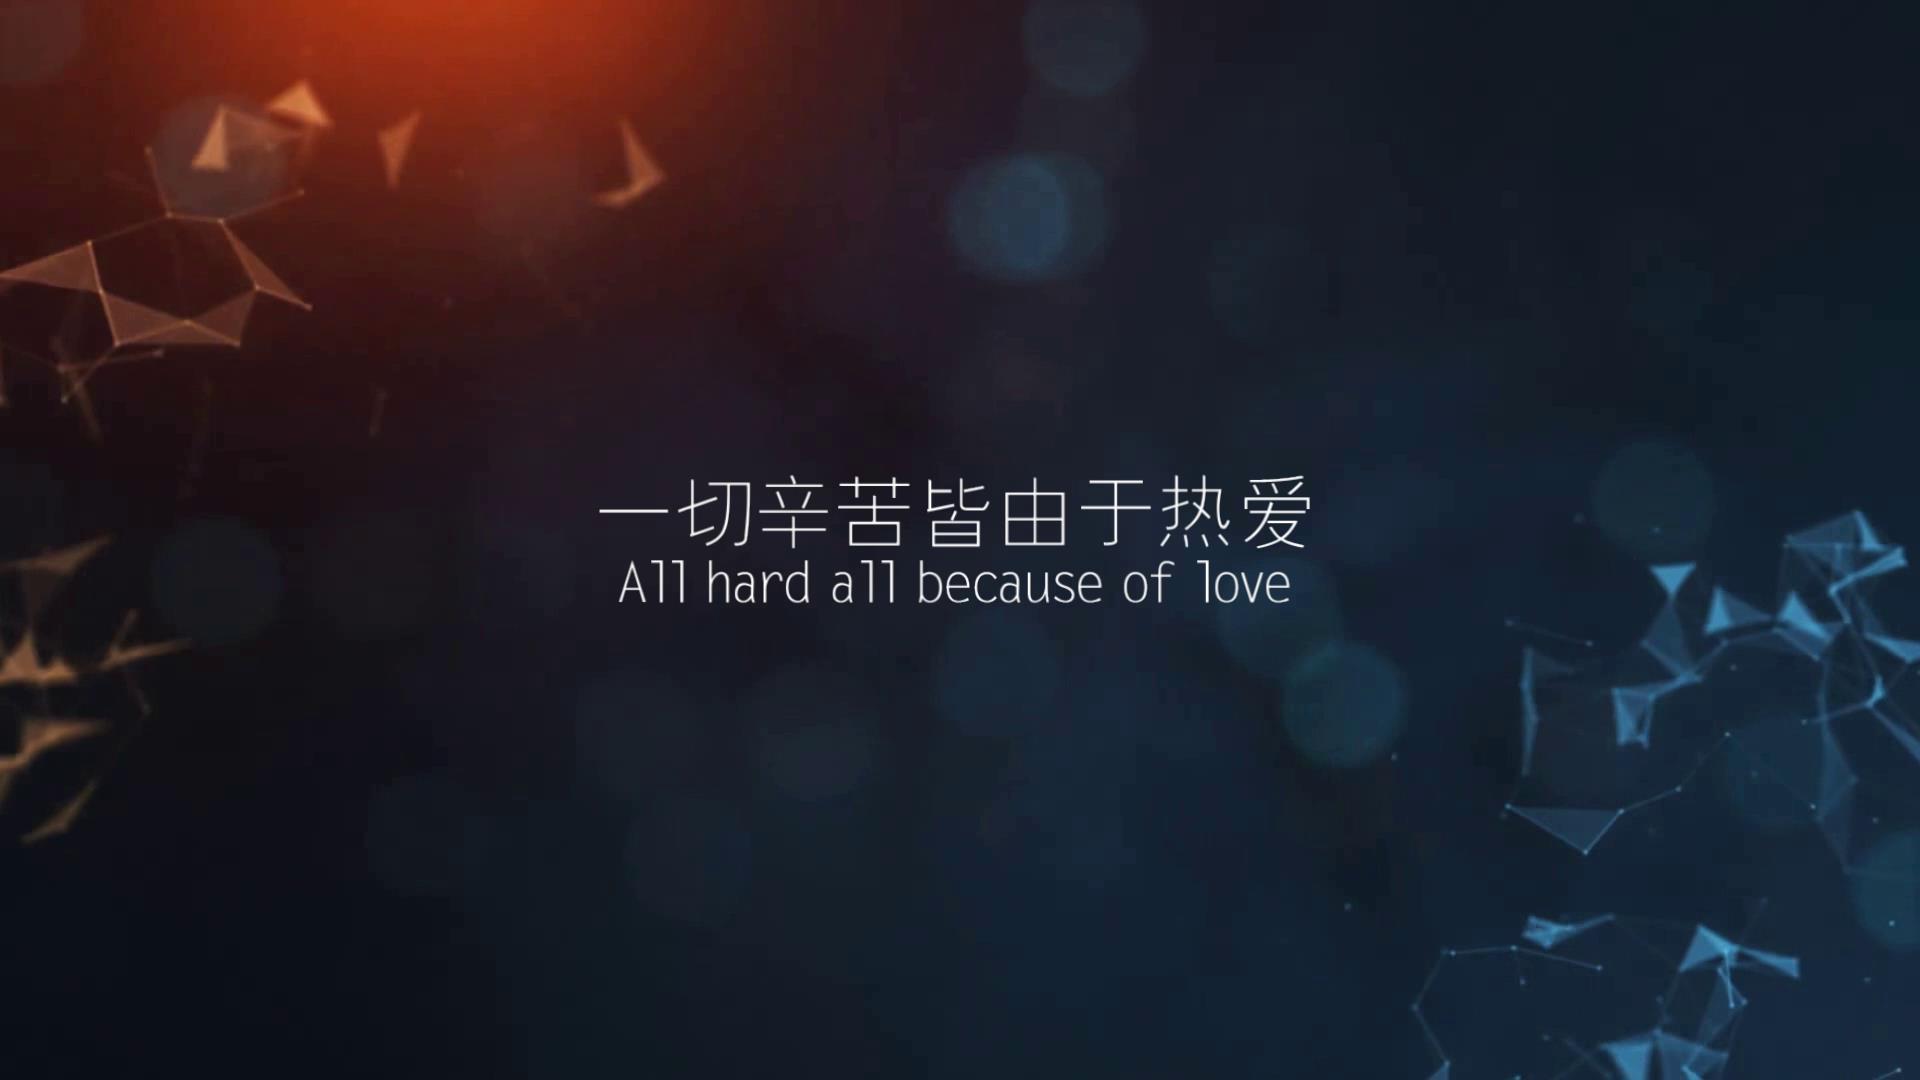 JOE\-9高端企业文字宣传片头模板